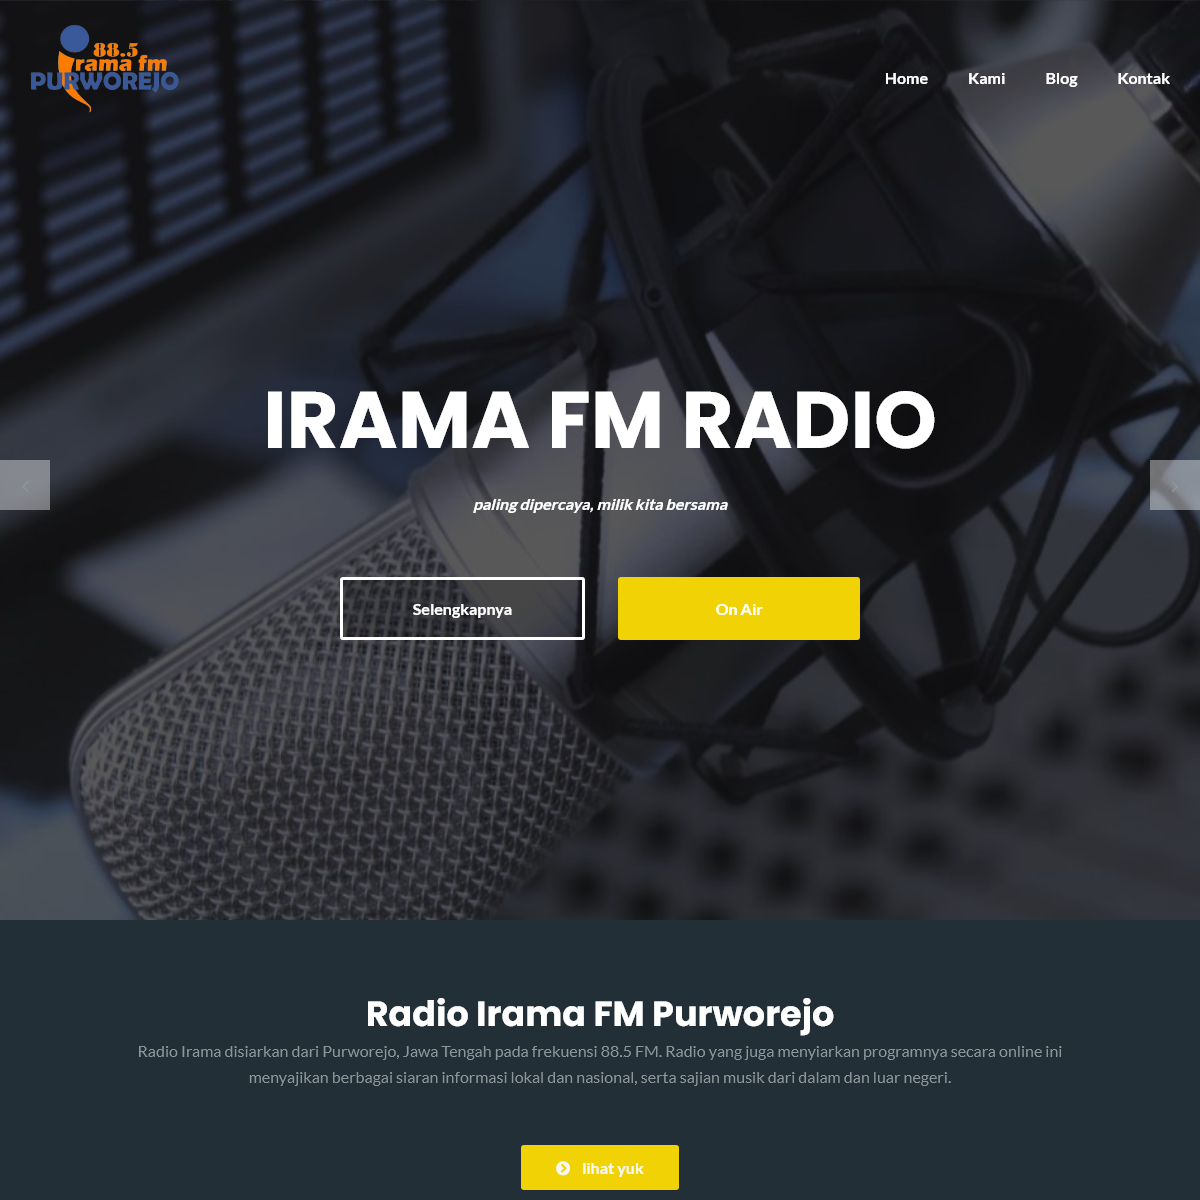 Irama FM Purworejo – Paling dipercaya, milik kita bersama